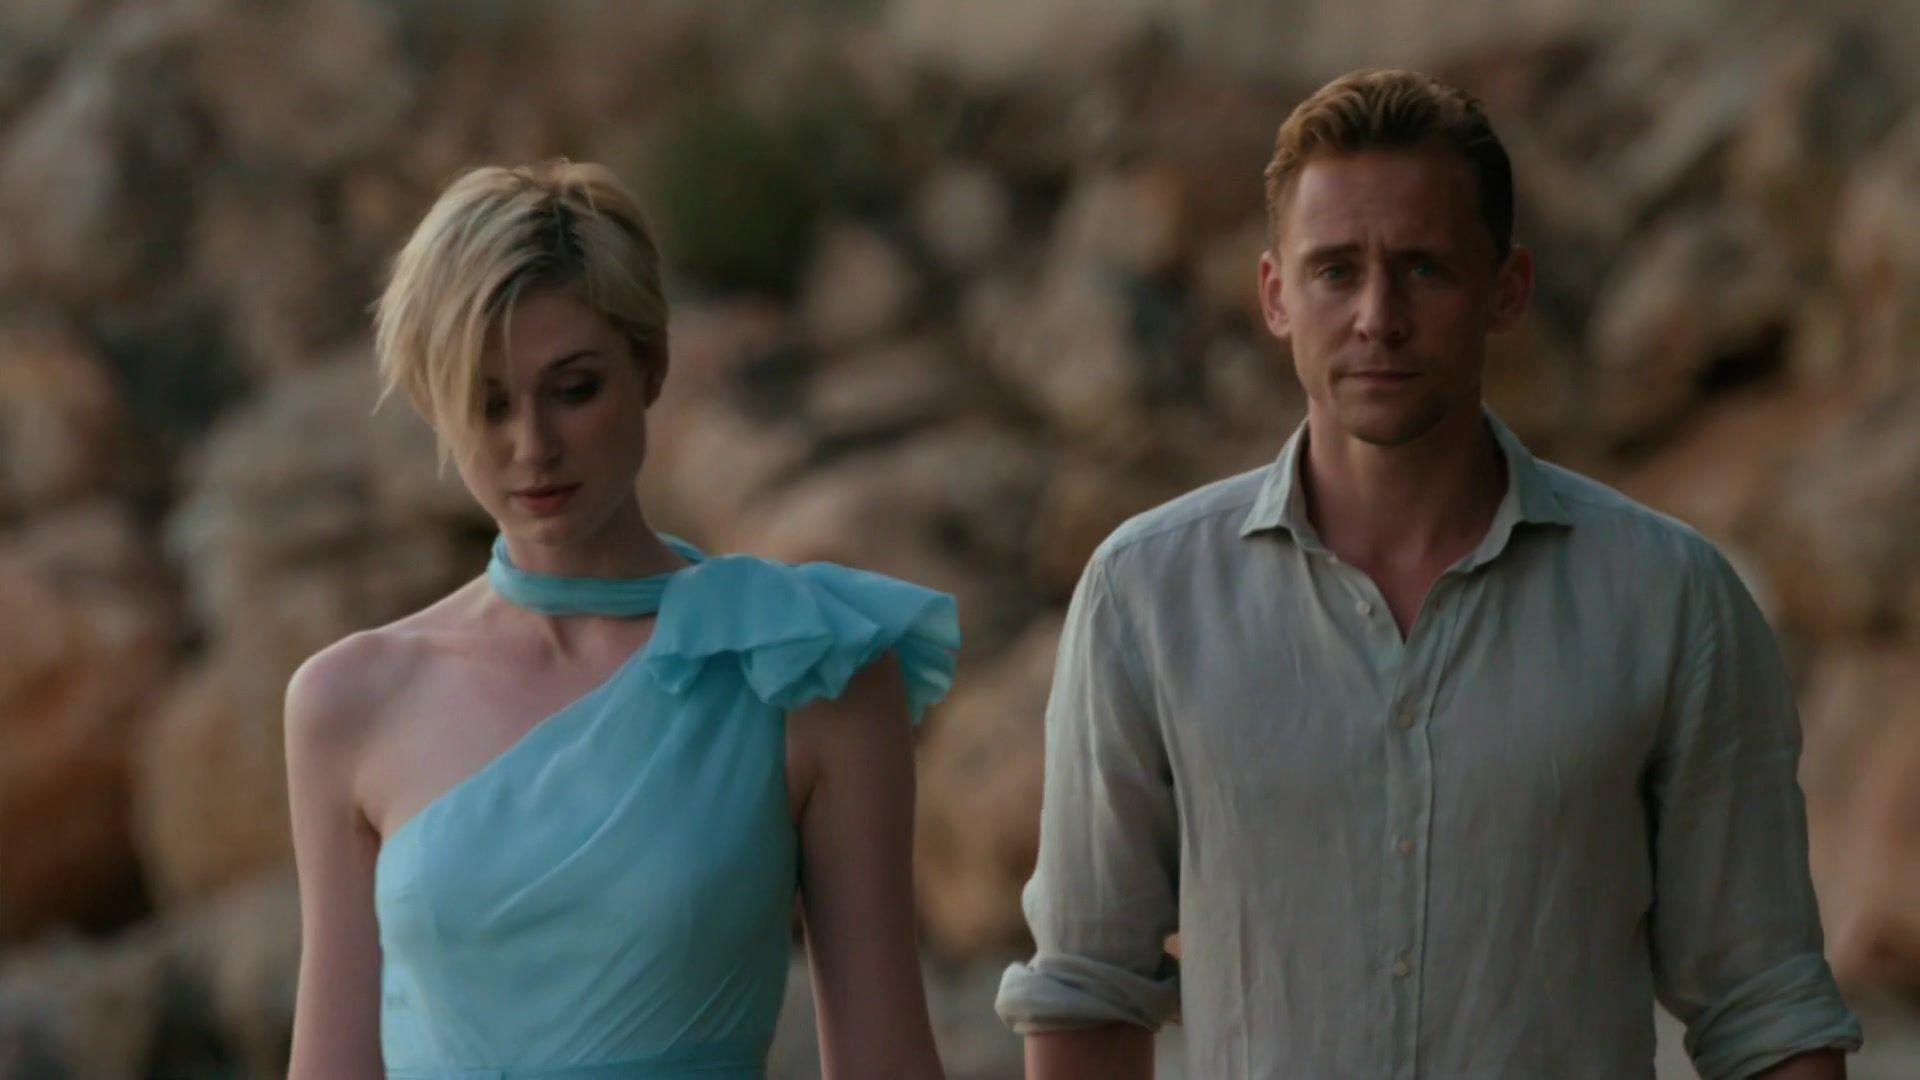 Tom Hiddleston. Via tom-hiddleston dot com.